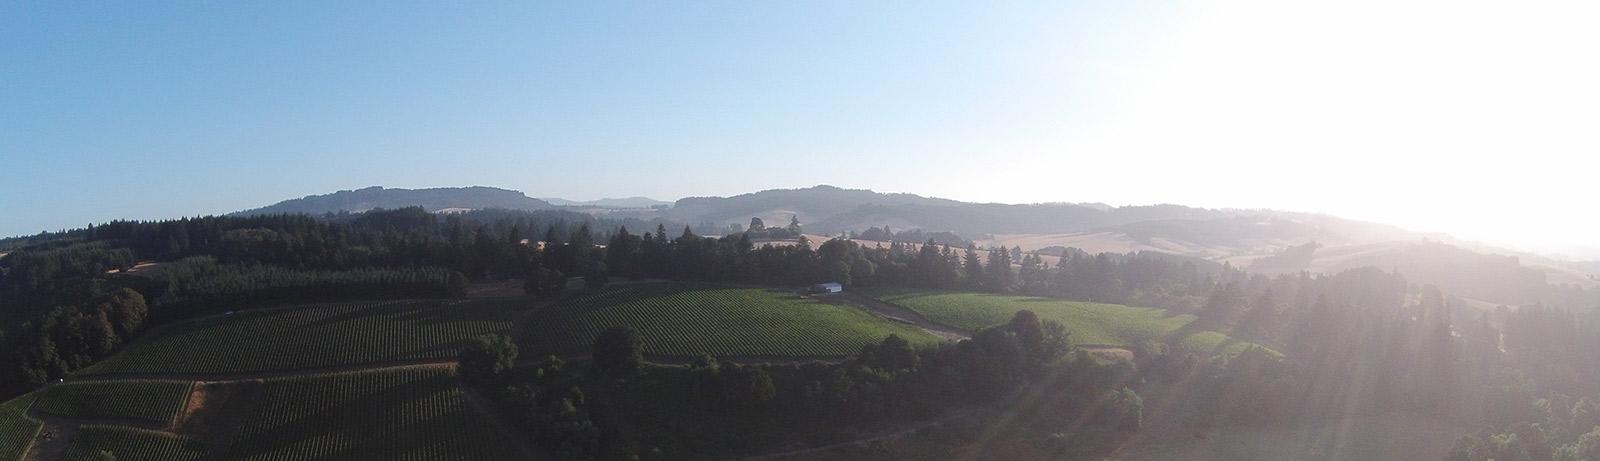 Oregon Wine Country by Brian Richardson, Vinbound Marketing